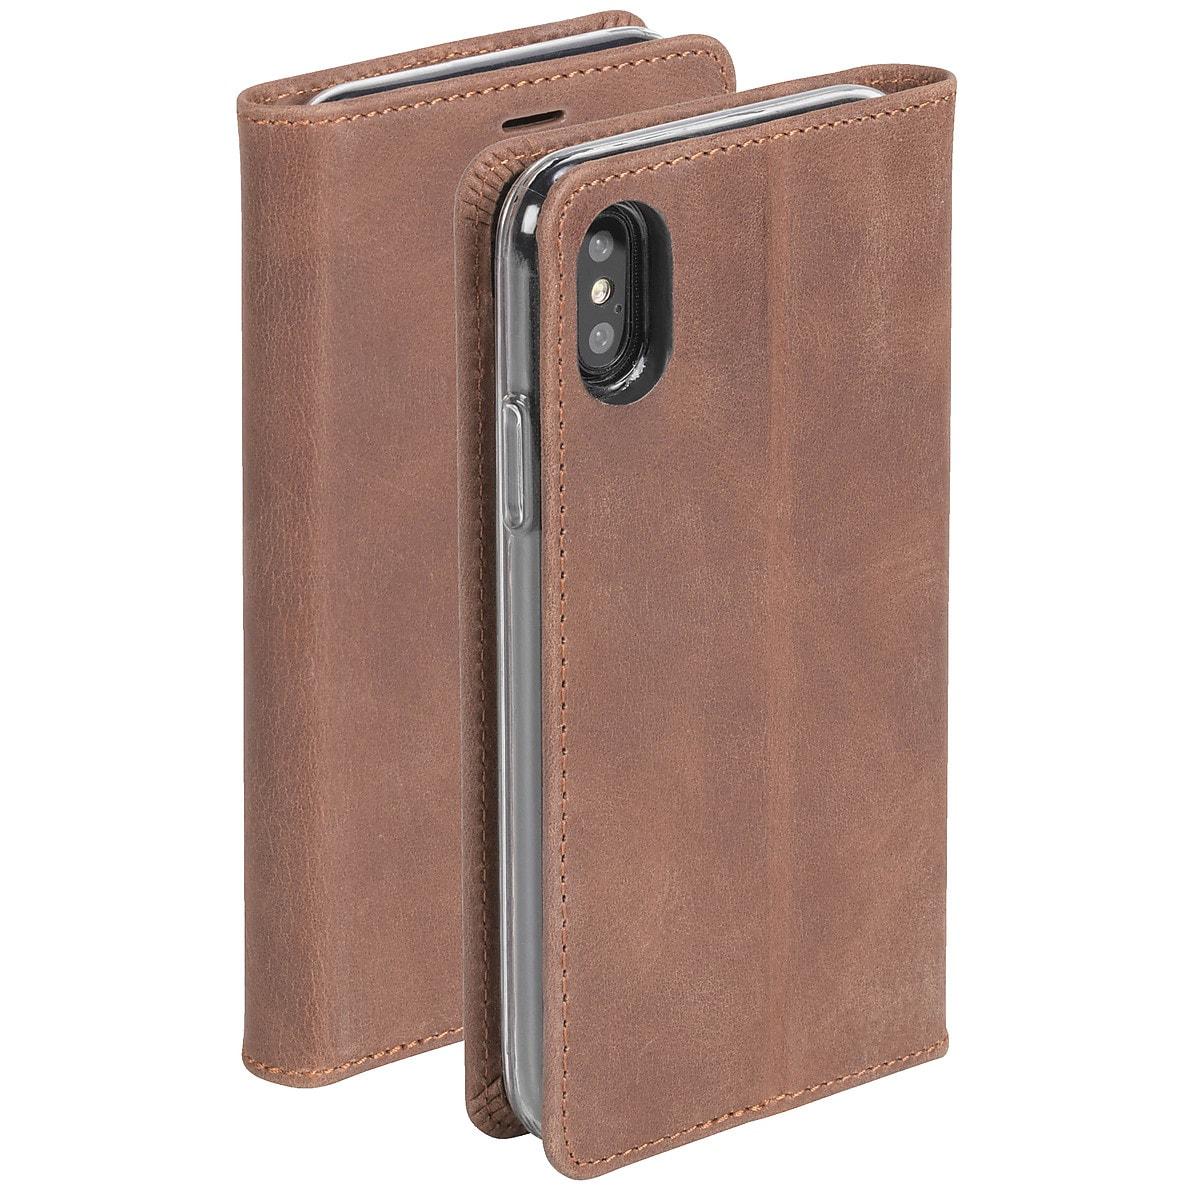 Plånboksfodral för iPhone X/XS Krusell Sunne FolioCase